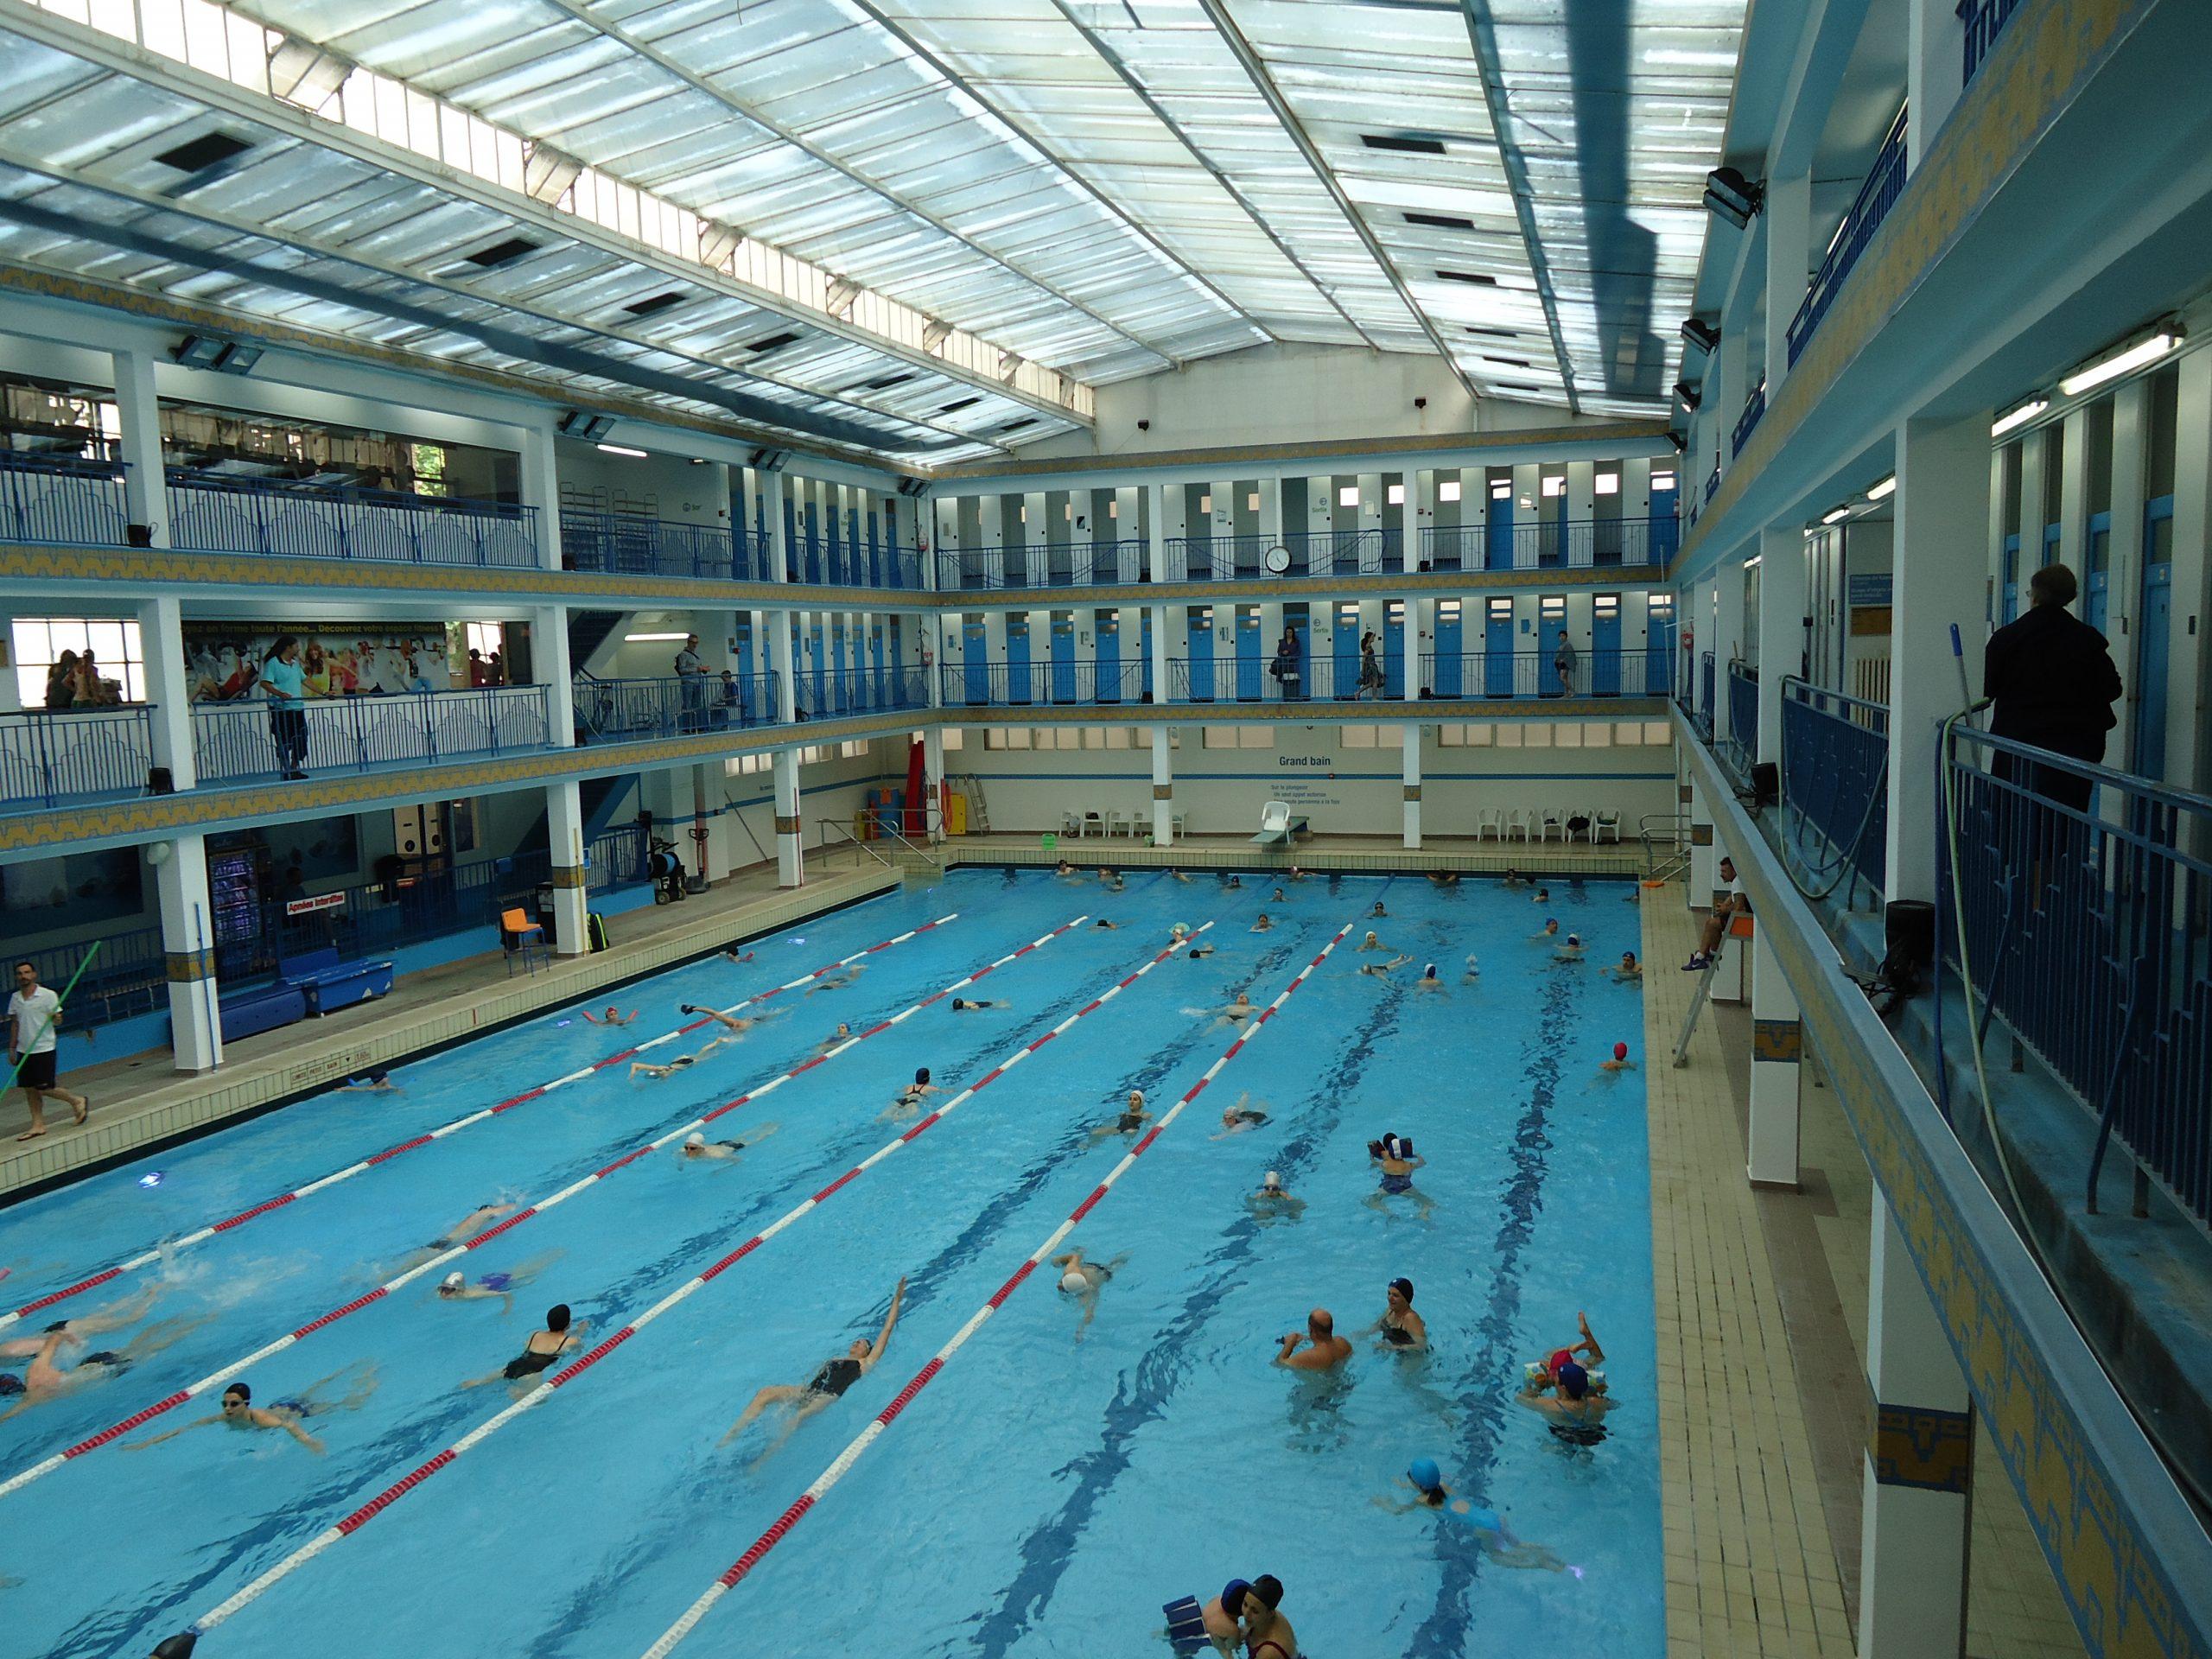 File:piscine Pontoise.jpg - Wikimedia Commons destiné Piscine Originale